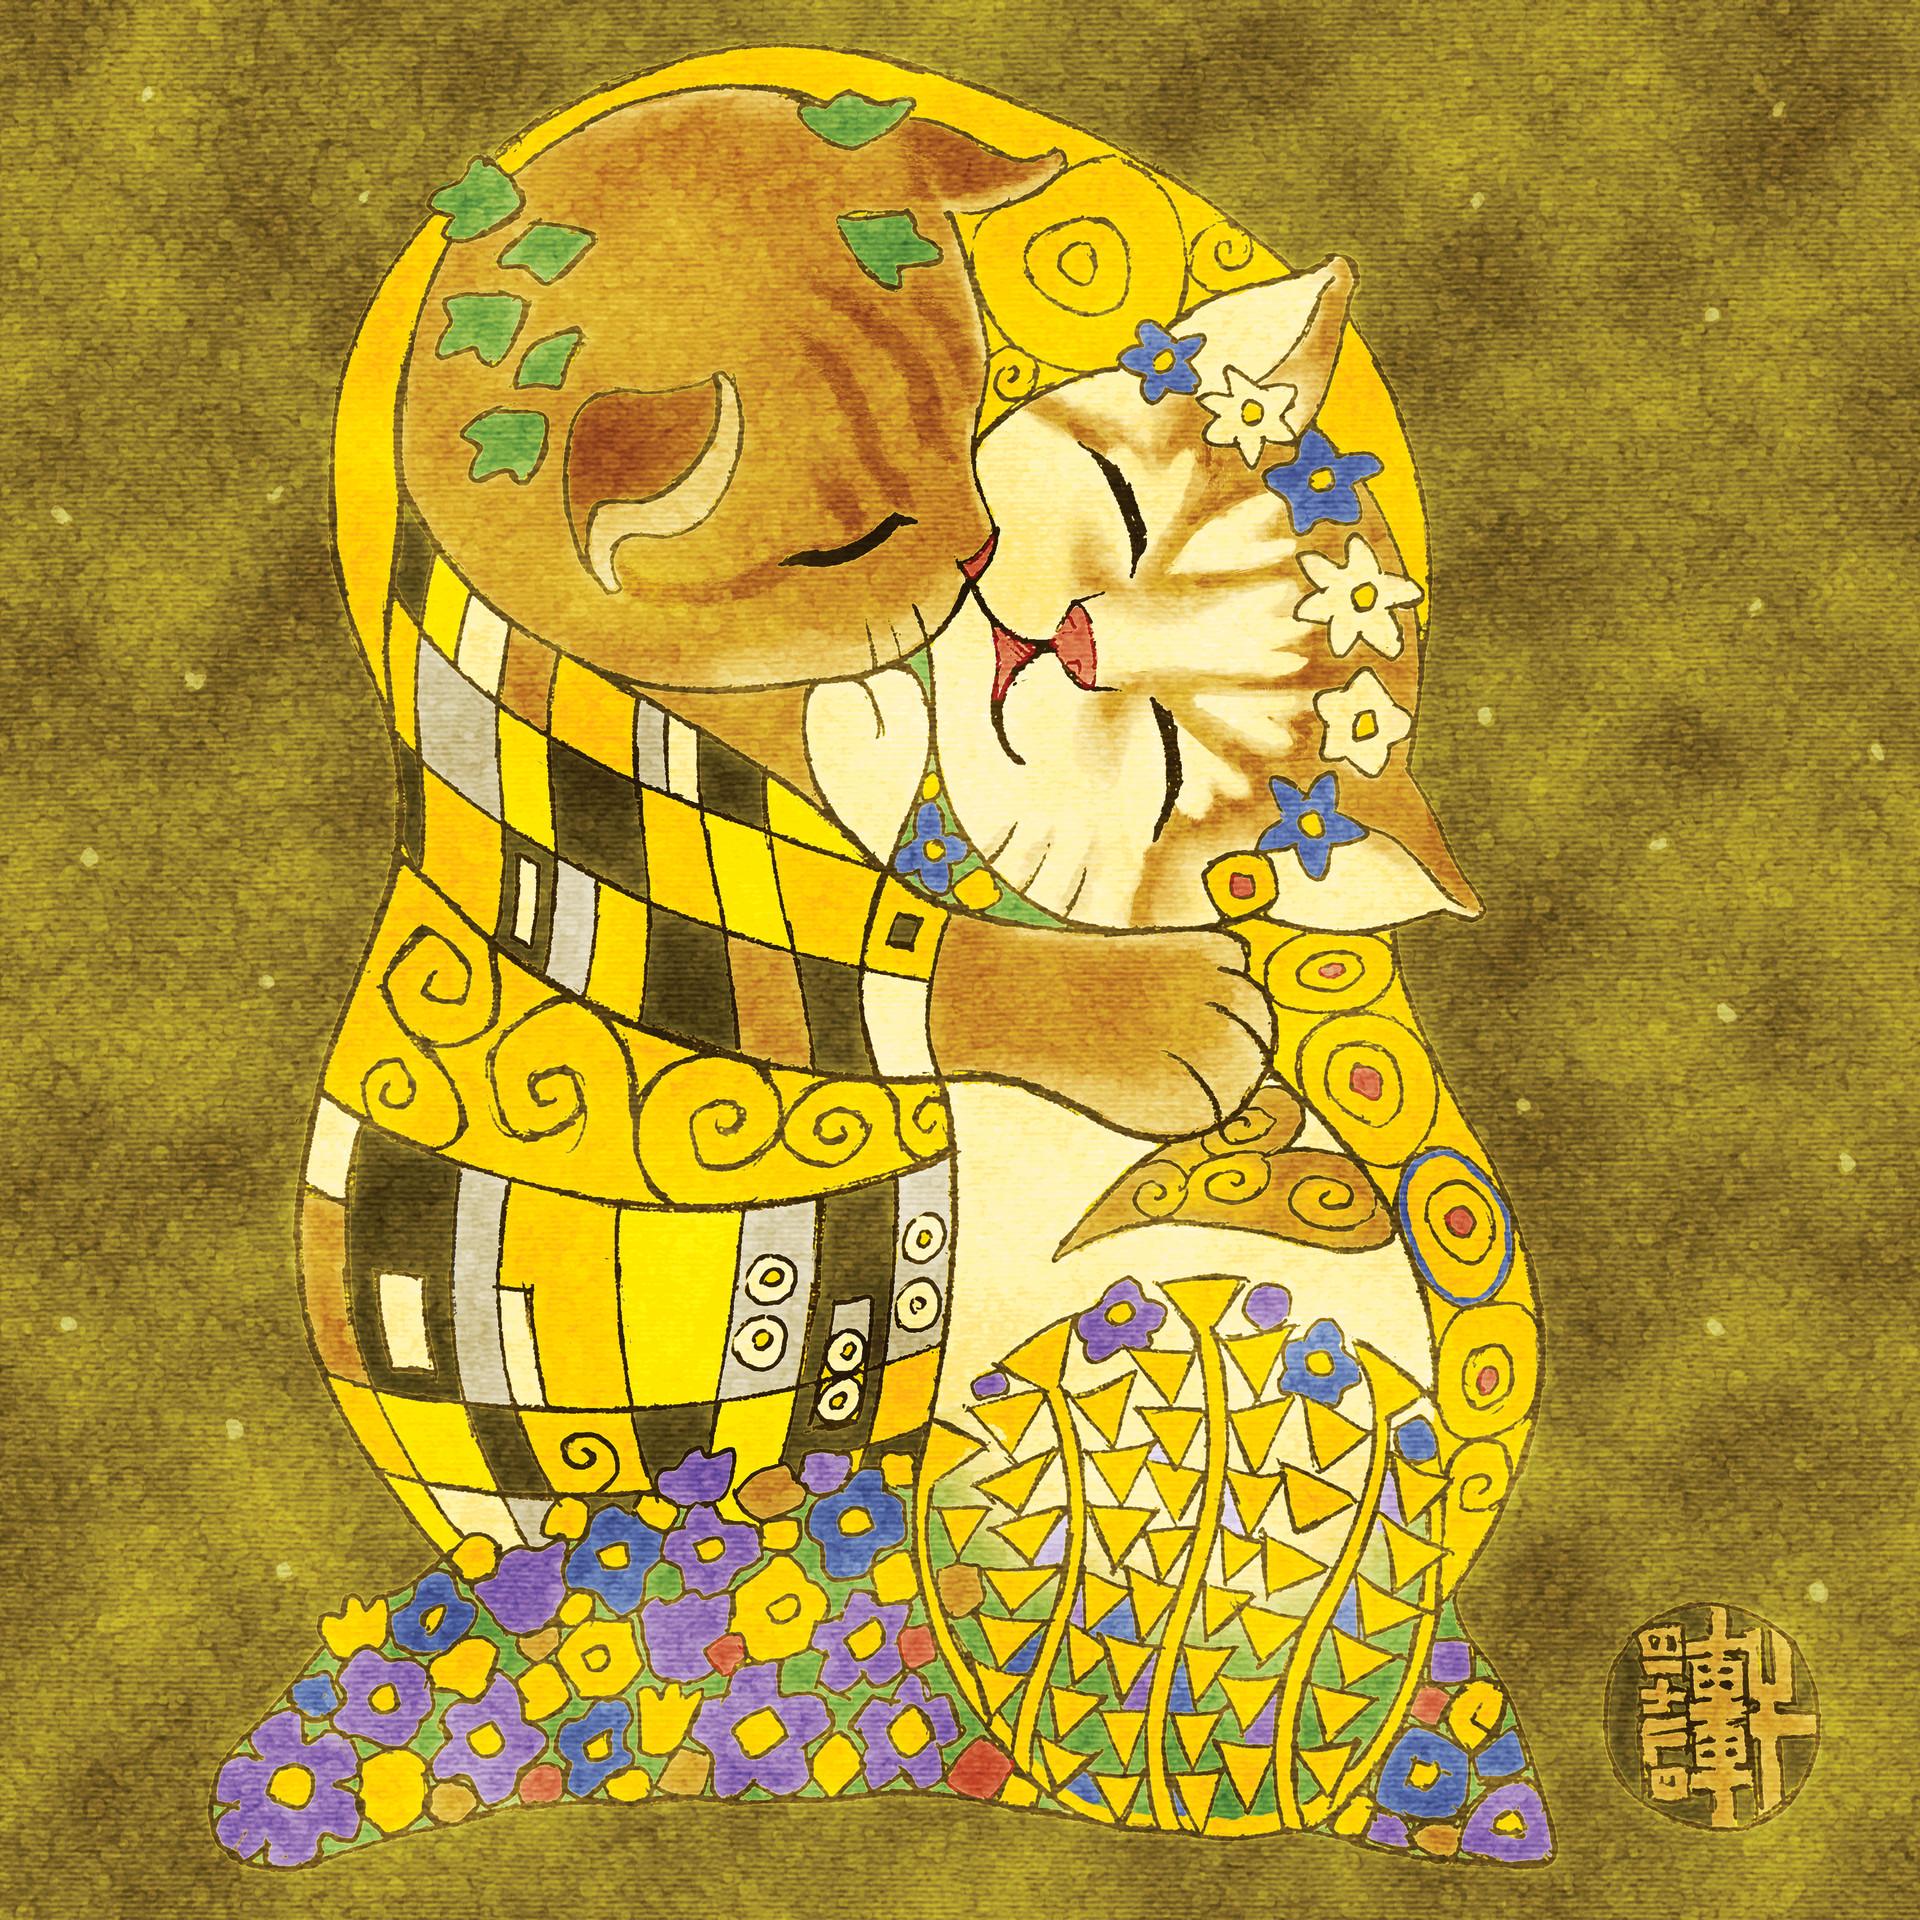 Day 07-14-18 - Klimt Kitten Kiss